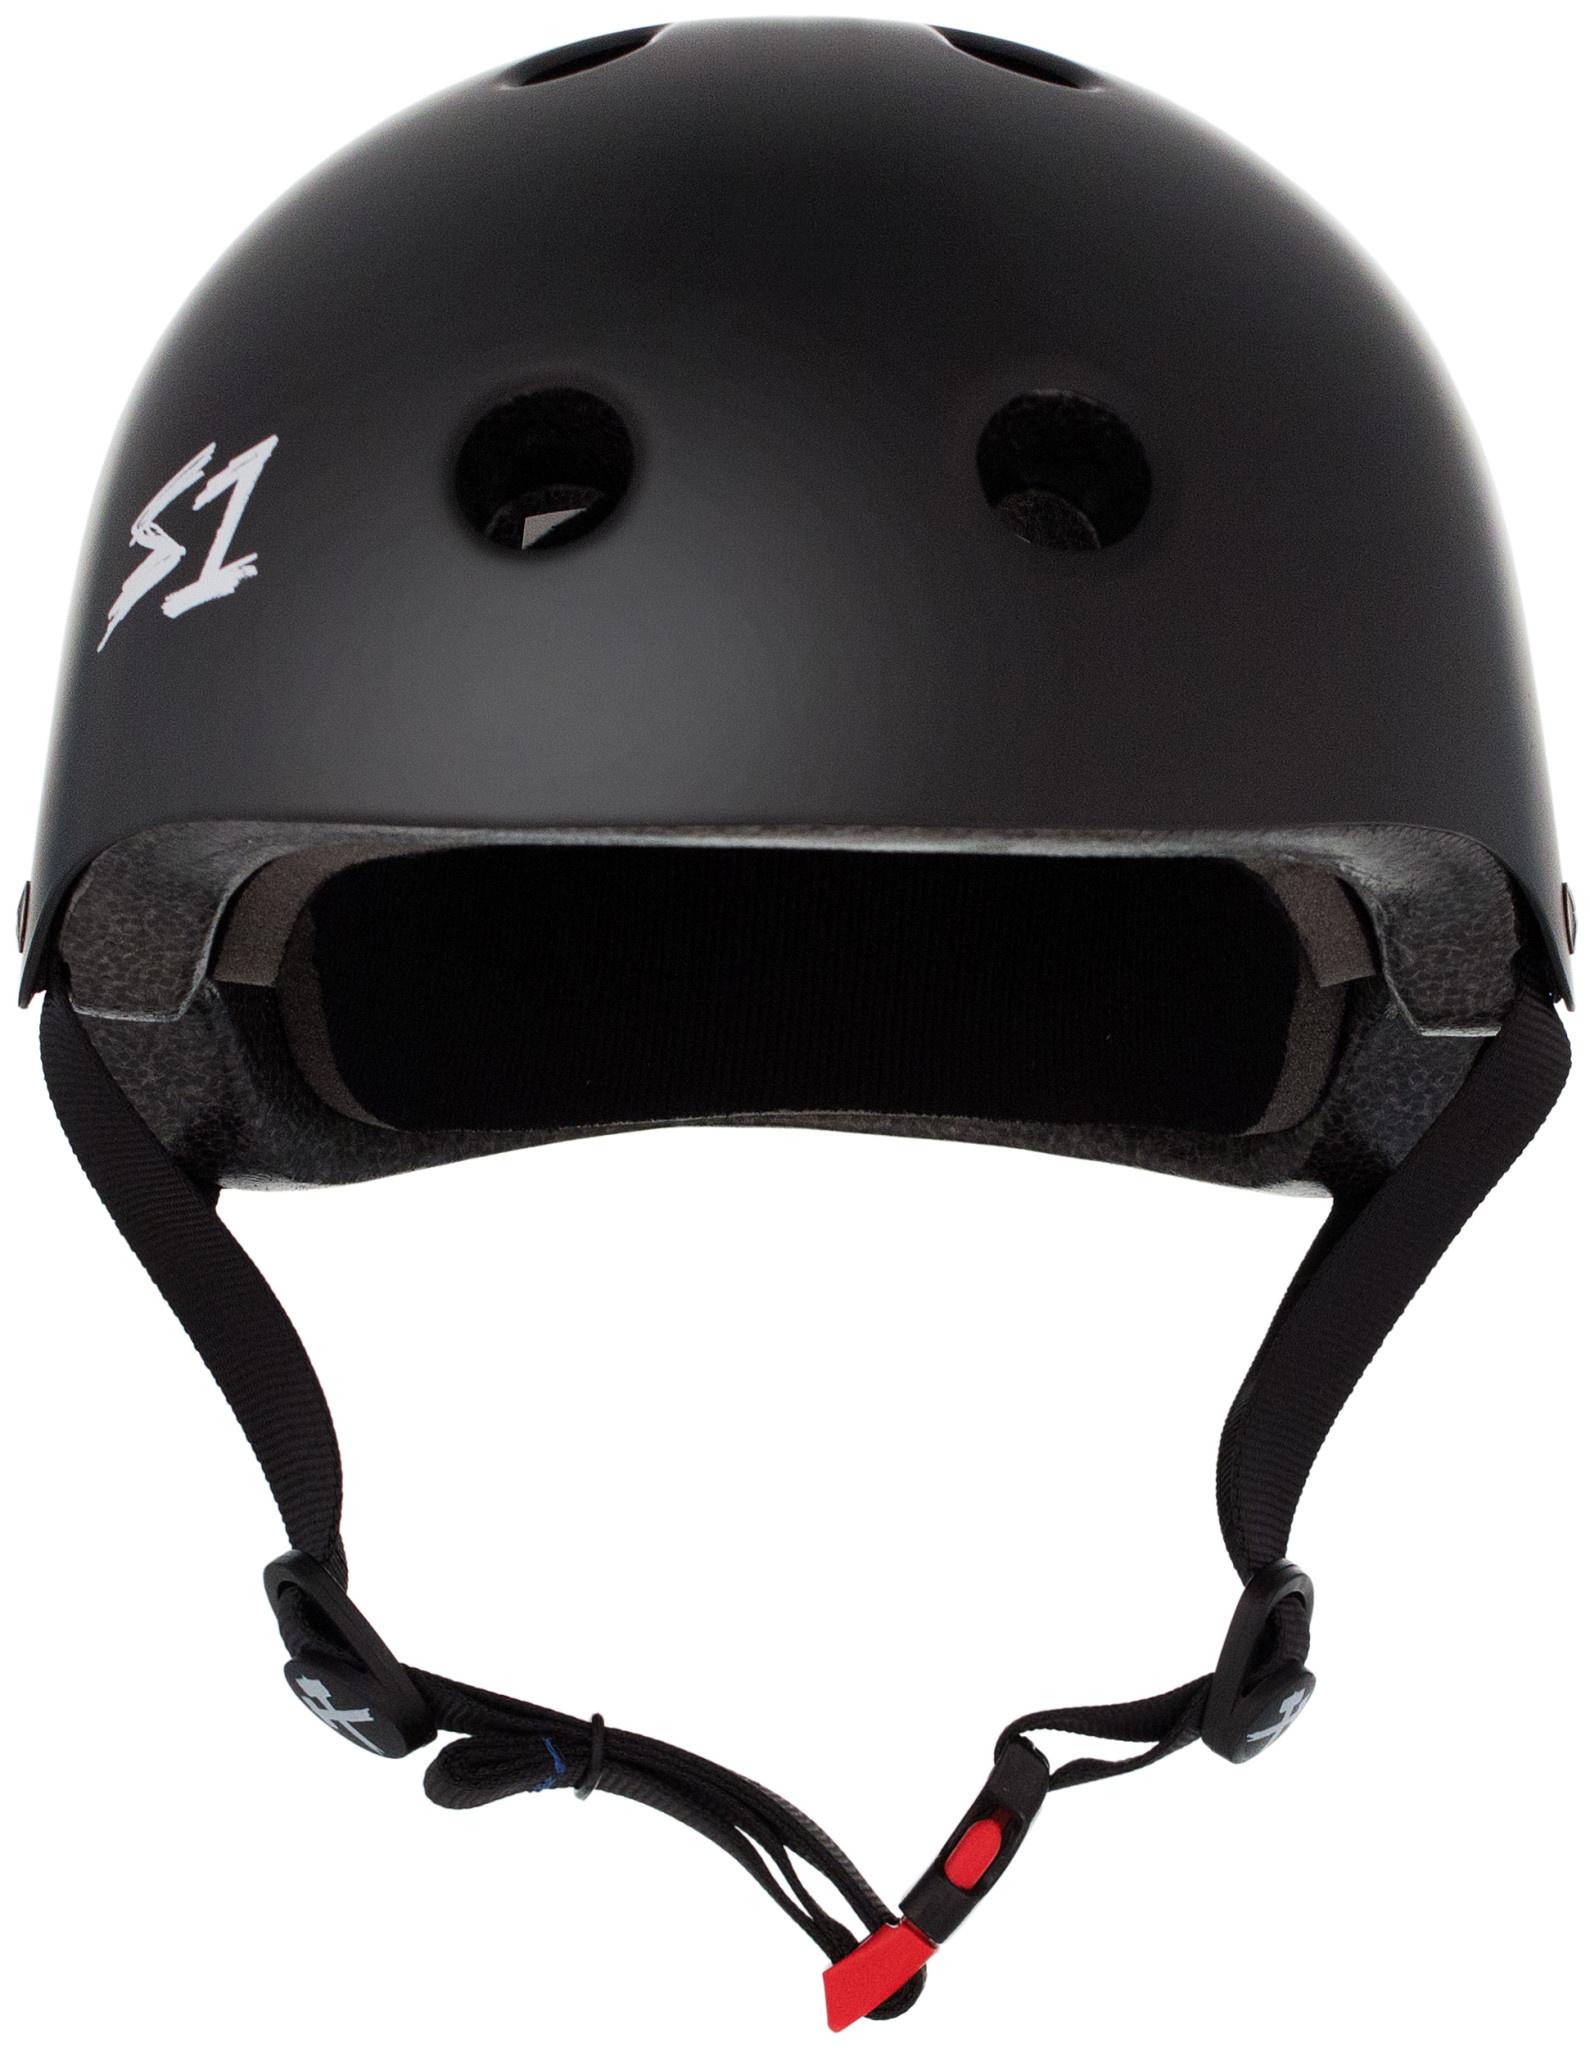 S-1 Mini Lifer Helmet - Black Matte